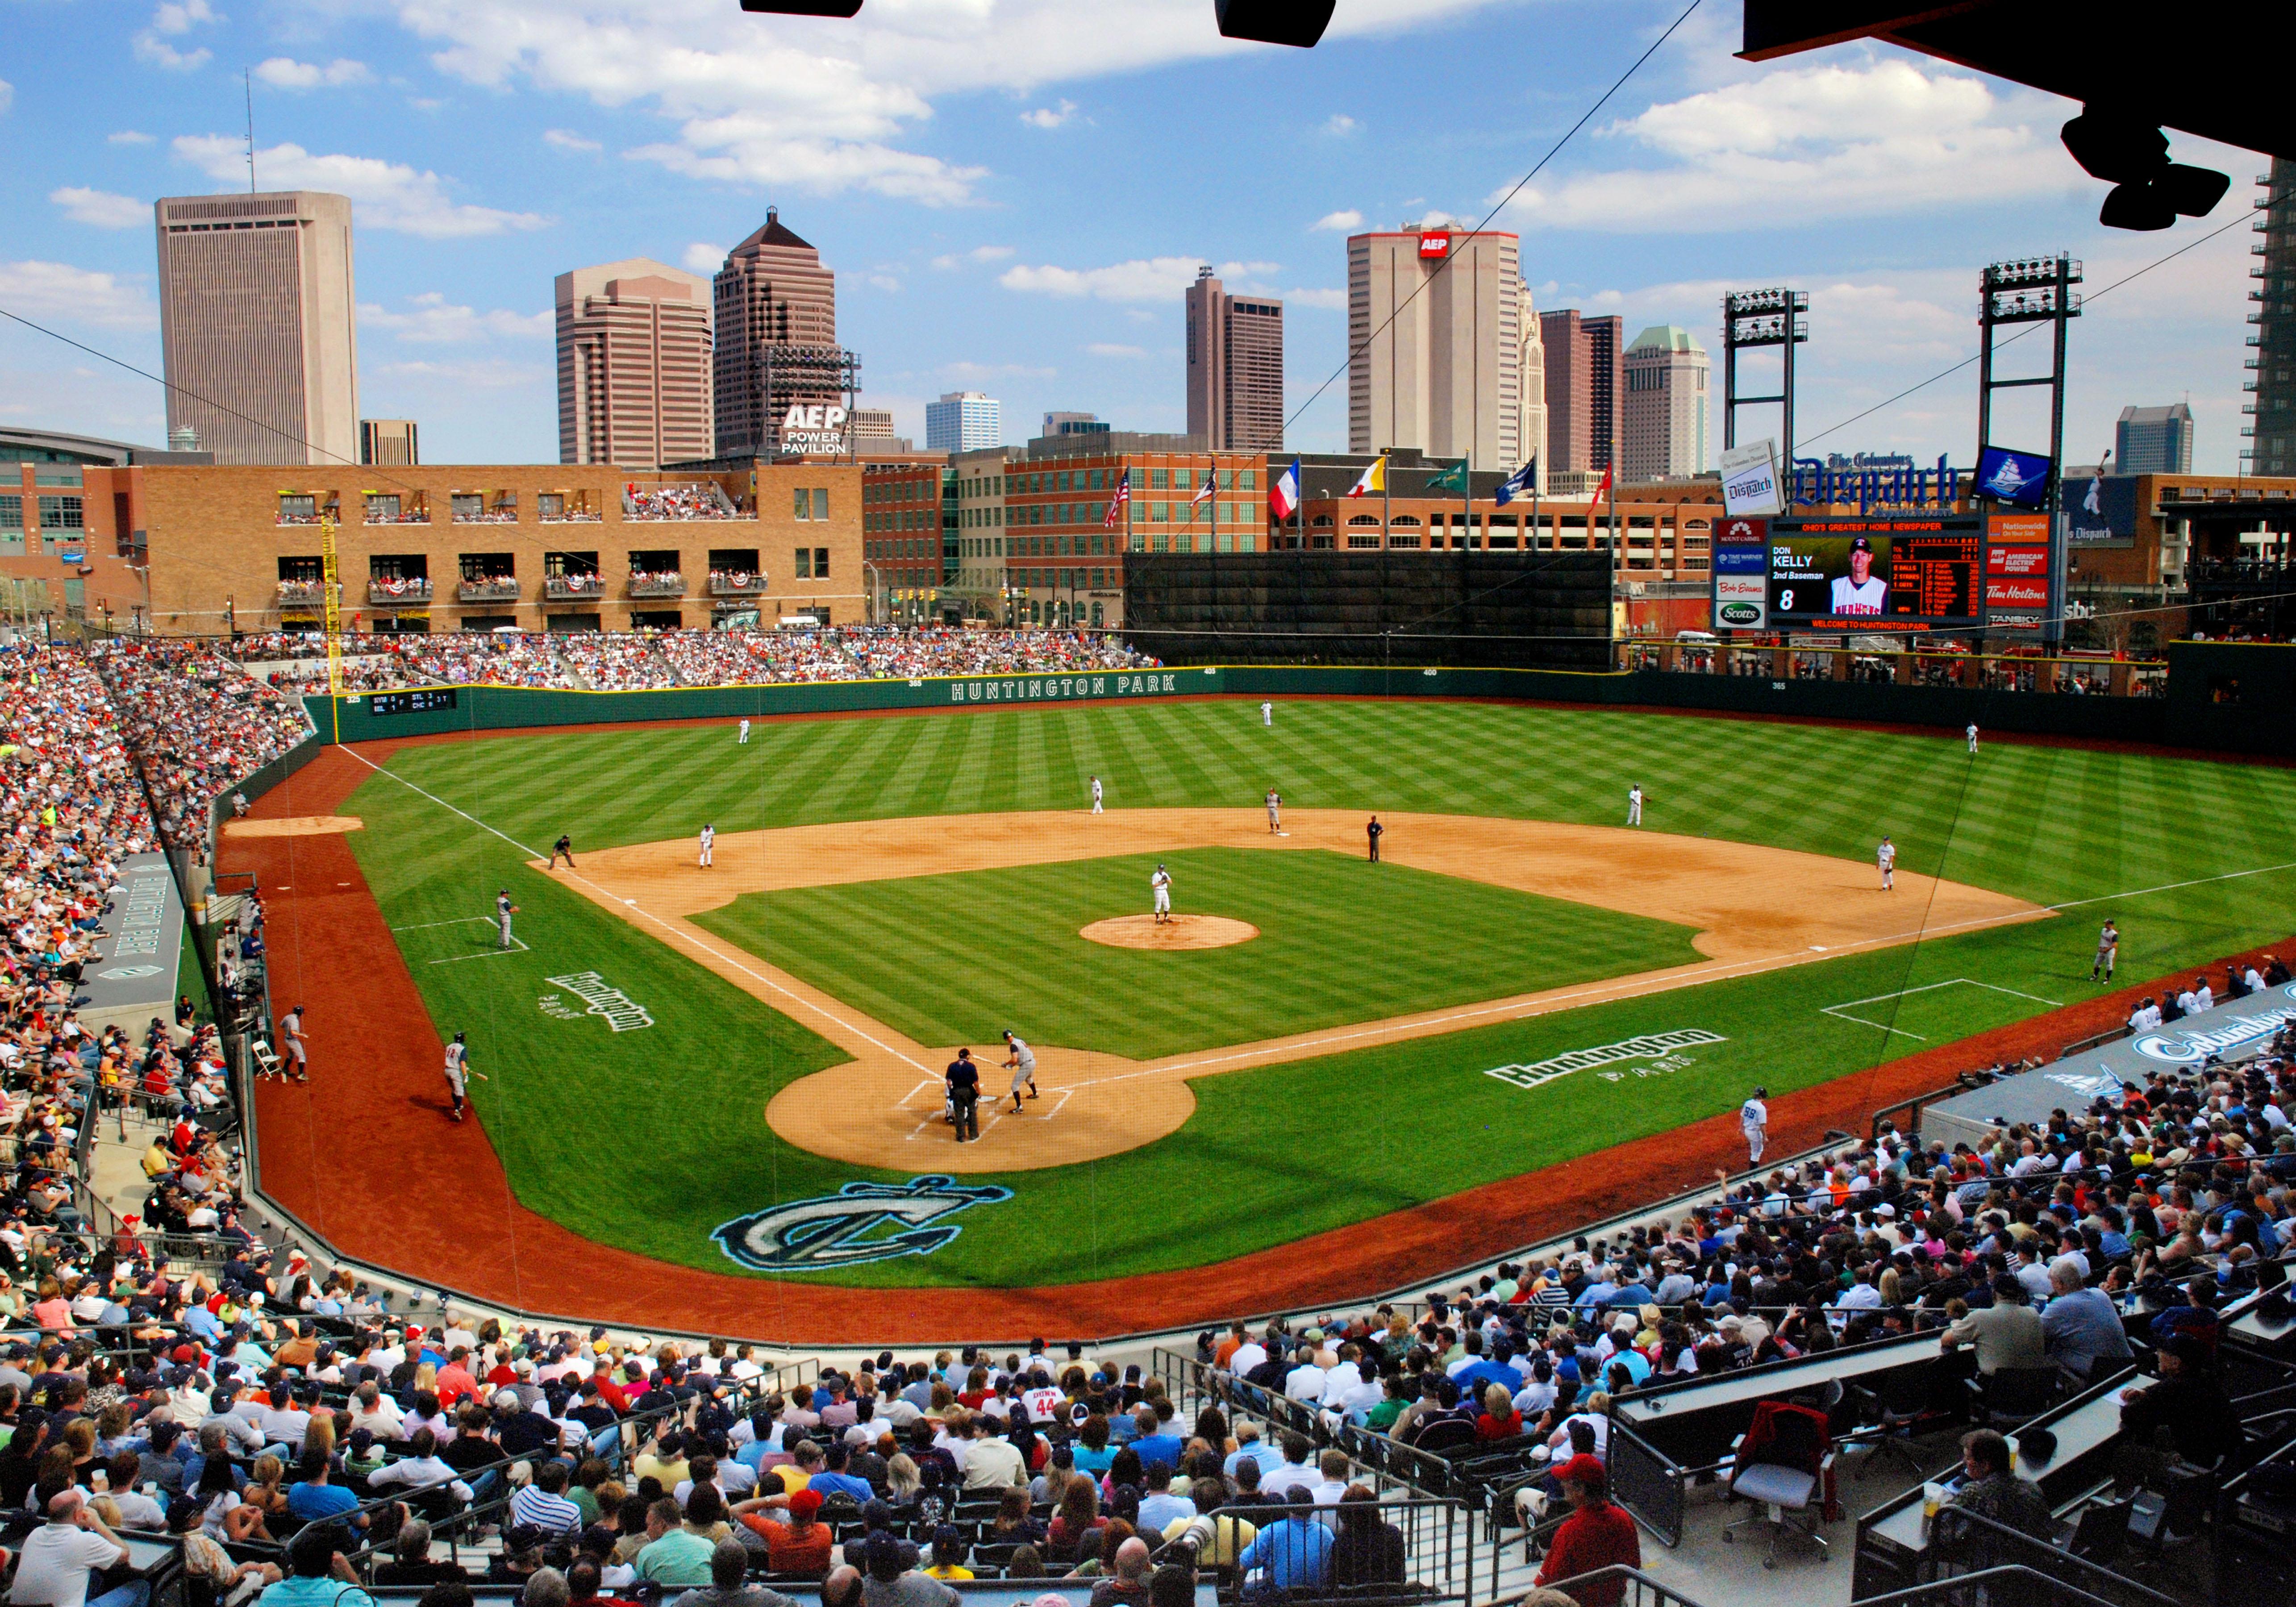 Baseball Maps And GIS GIS Lounge Best Me Hubs Images On - Us baseball map